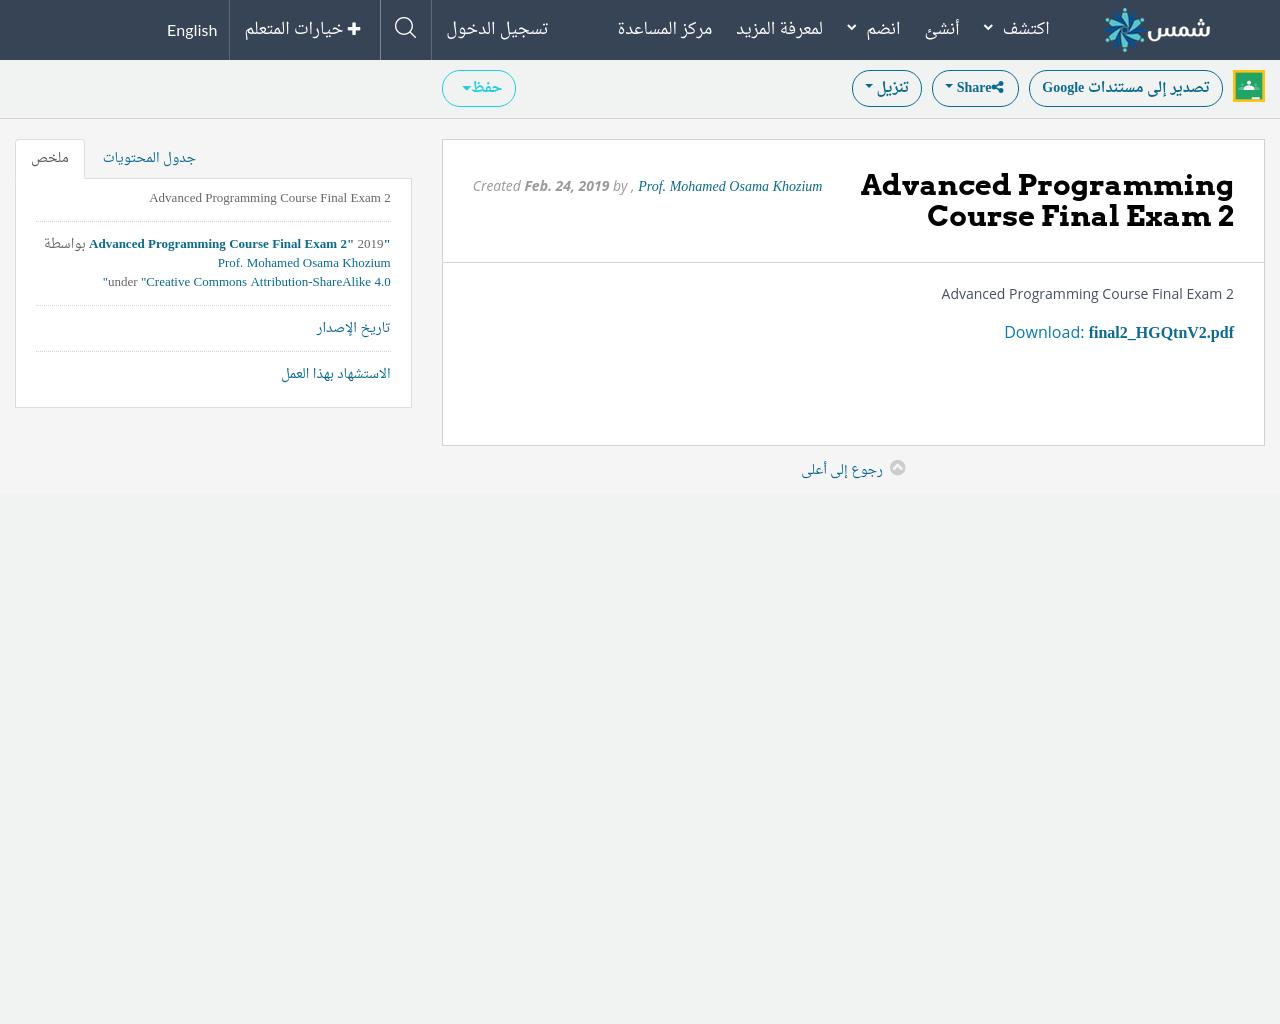 Advanced Programming Course Final Exam 2   SHMS - Saudi OER